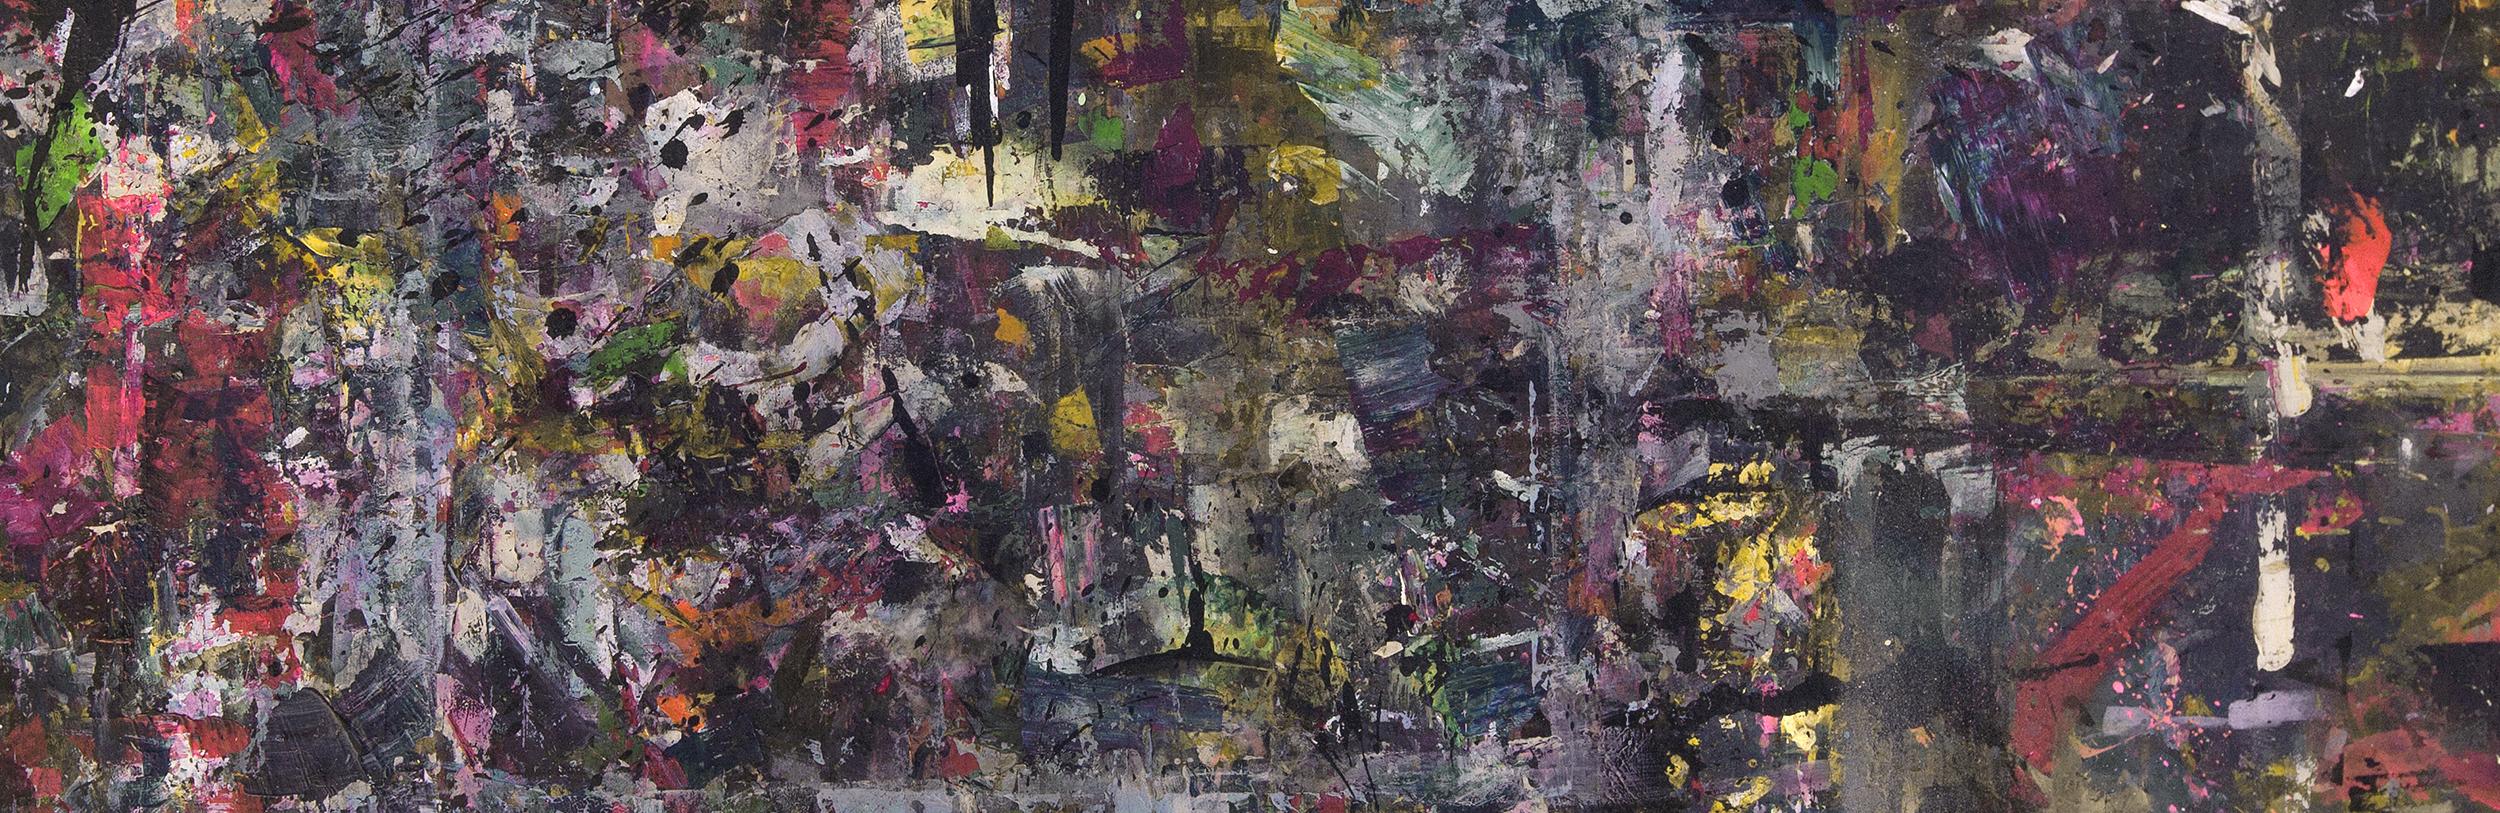 bonjourmolotov+covers+Illustration+Ilustracao+painting+pintura+acrylic+acrílico+canvas+tela+paper+cardboard+mdf+Andre+Gigante+07CN8B.jpg